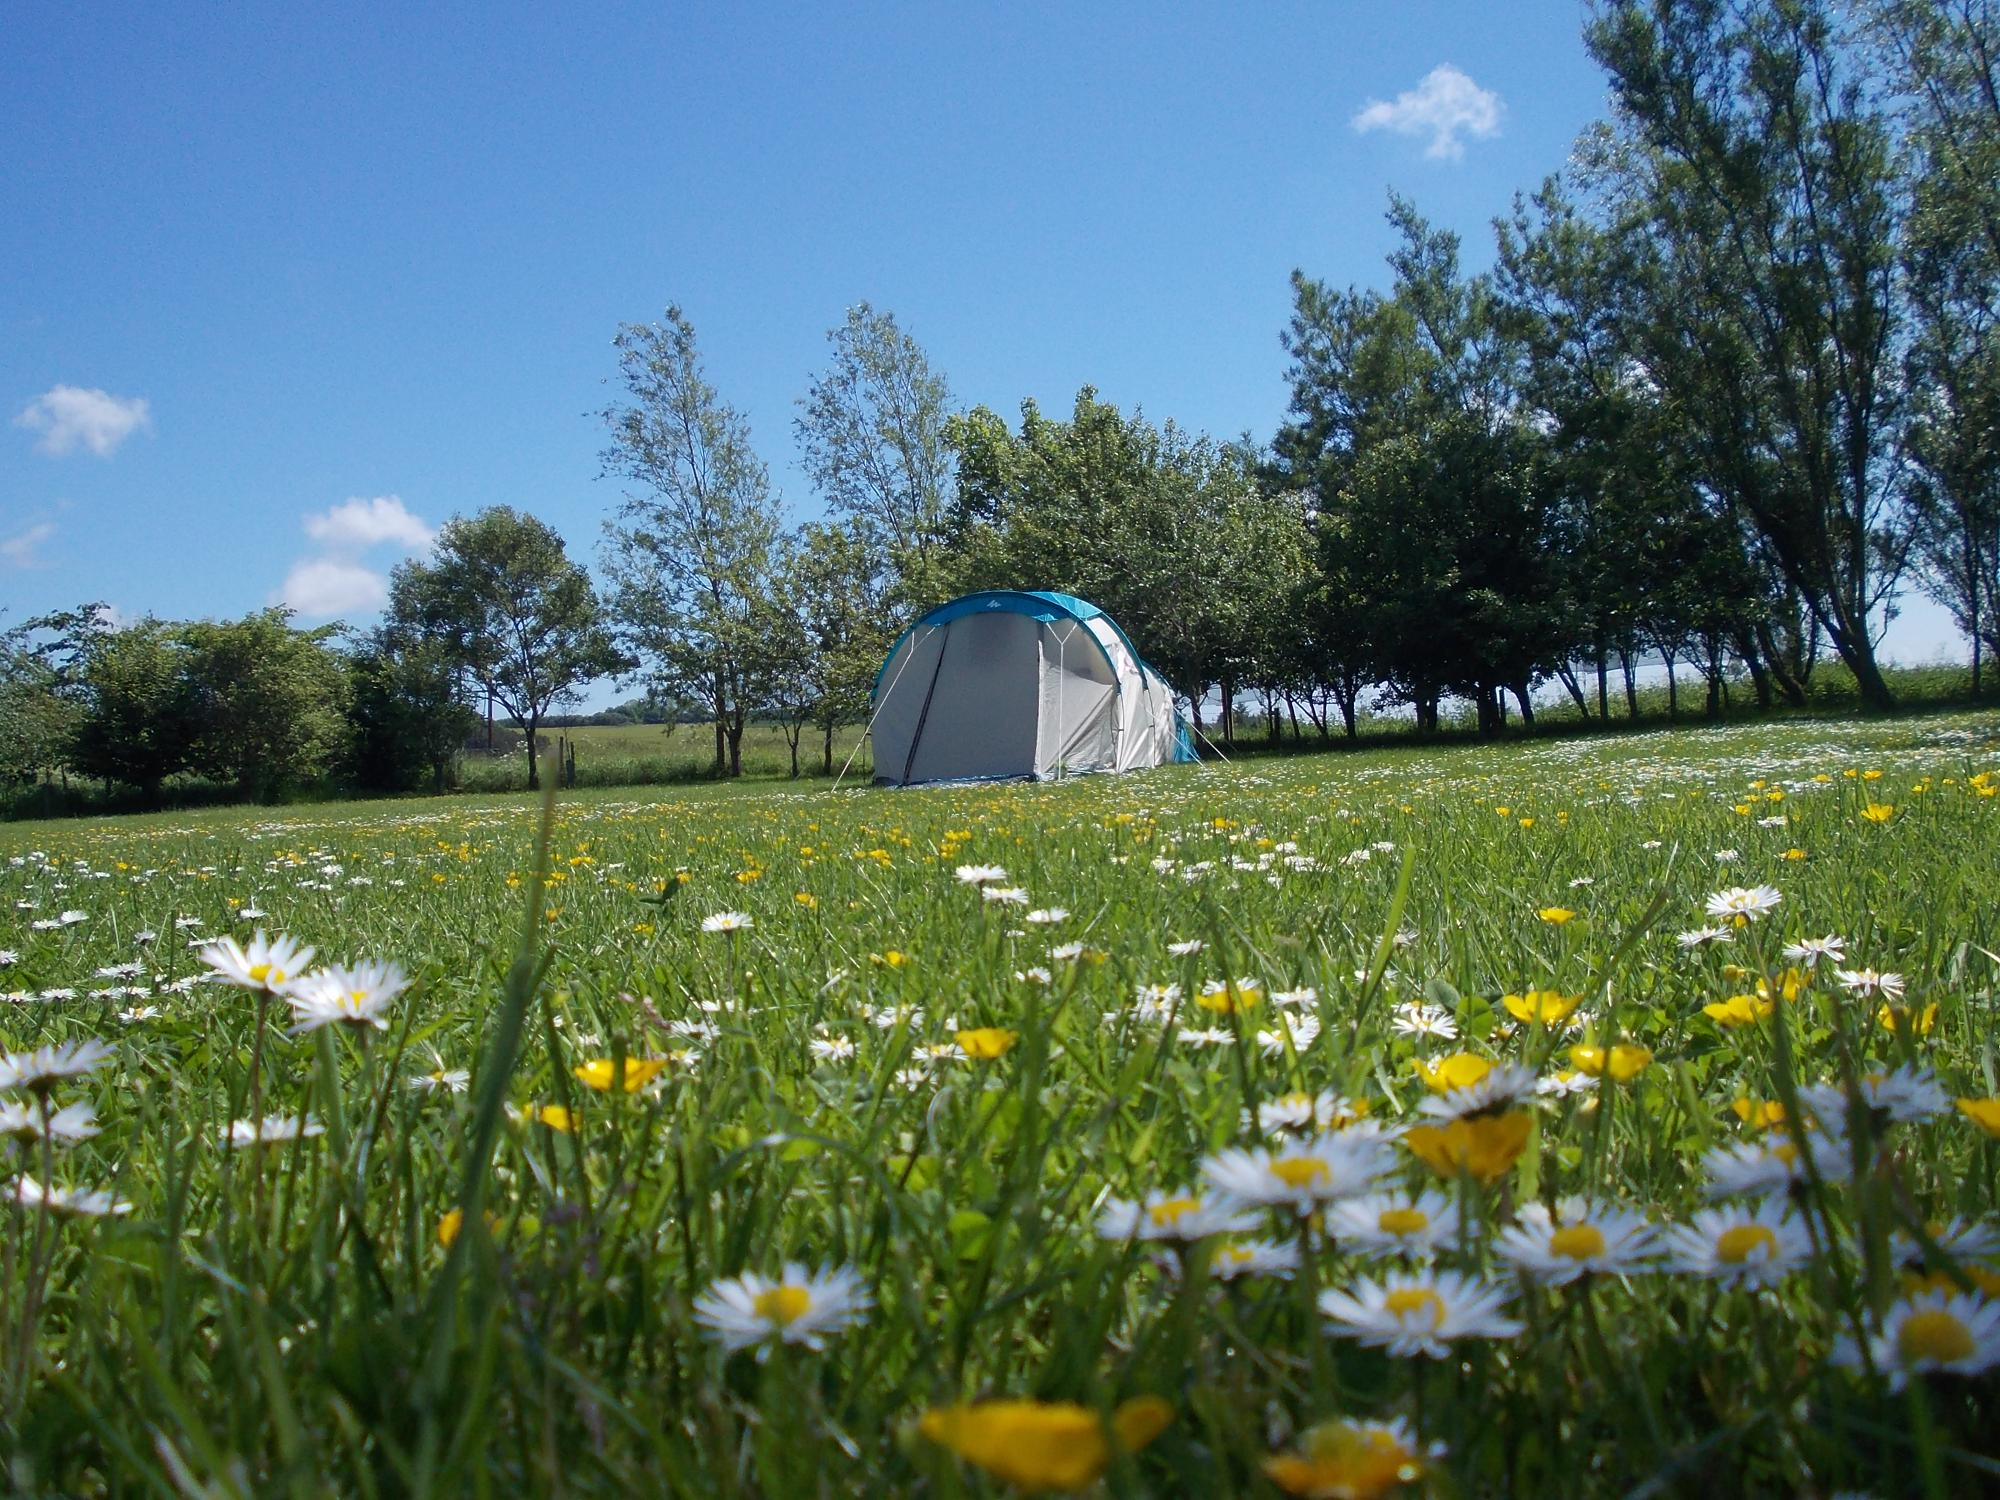 Ythan Valley Campsite